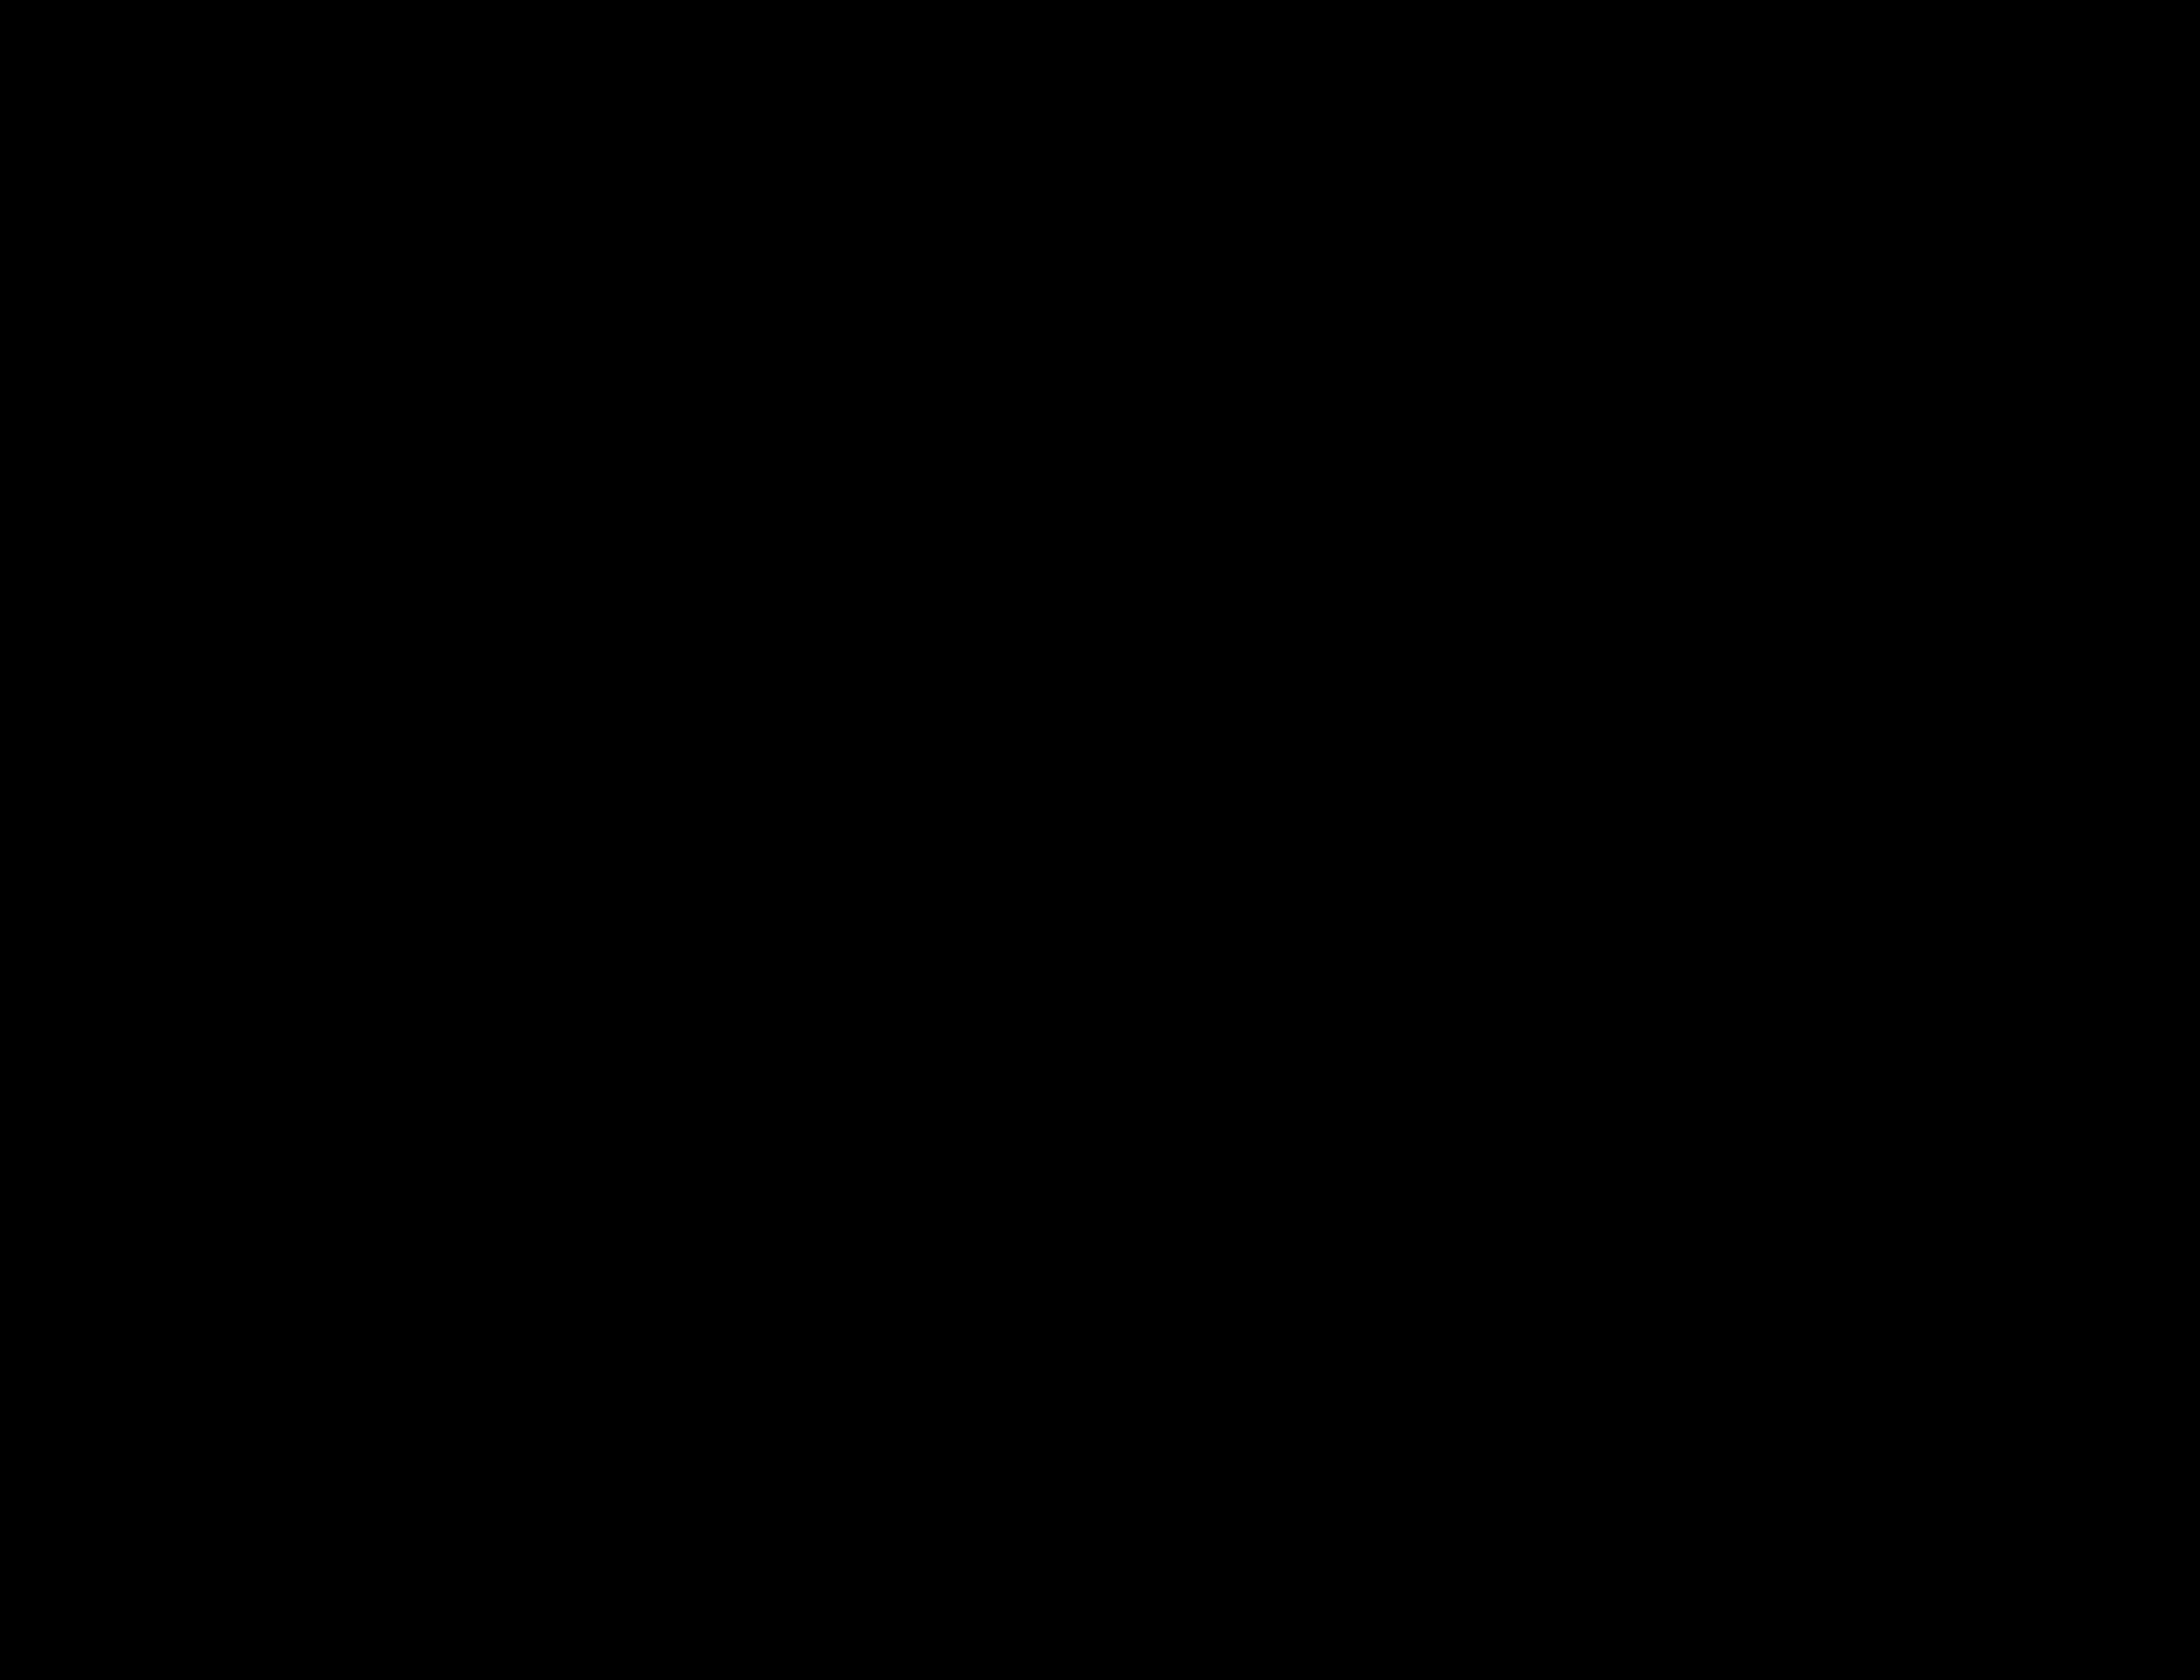 ariadne-athens-logo